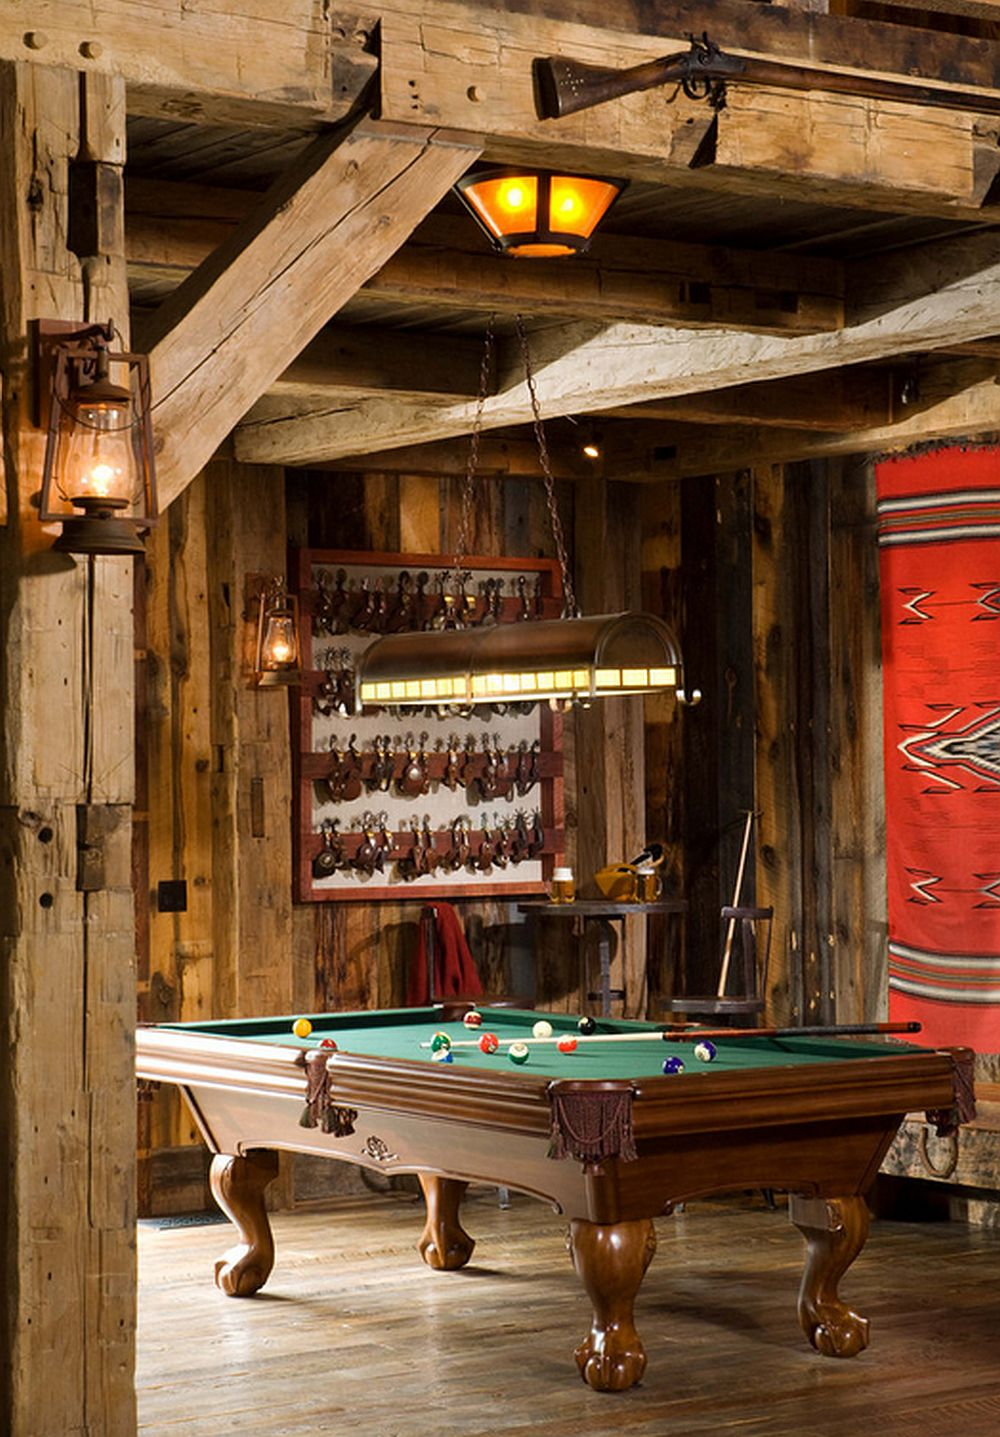 adelaparvu.com despre cabana din lemn vechi recuperat, cabana Swan Valley, Montana, RMT Architects (9)